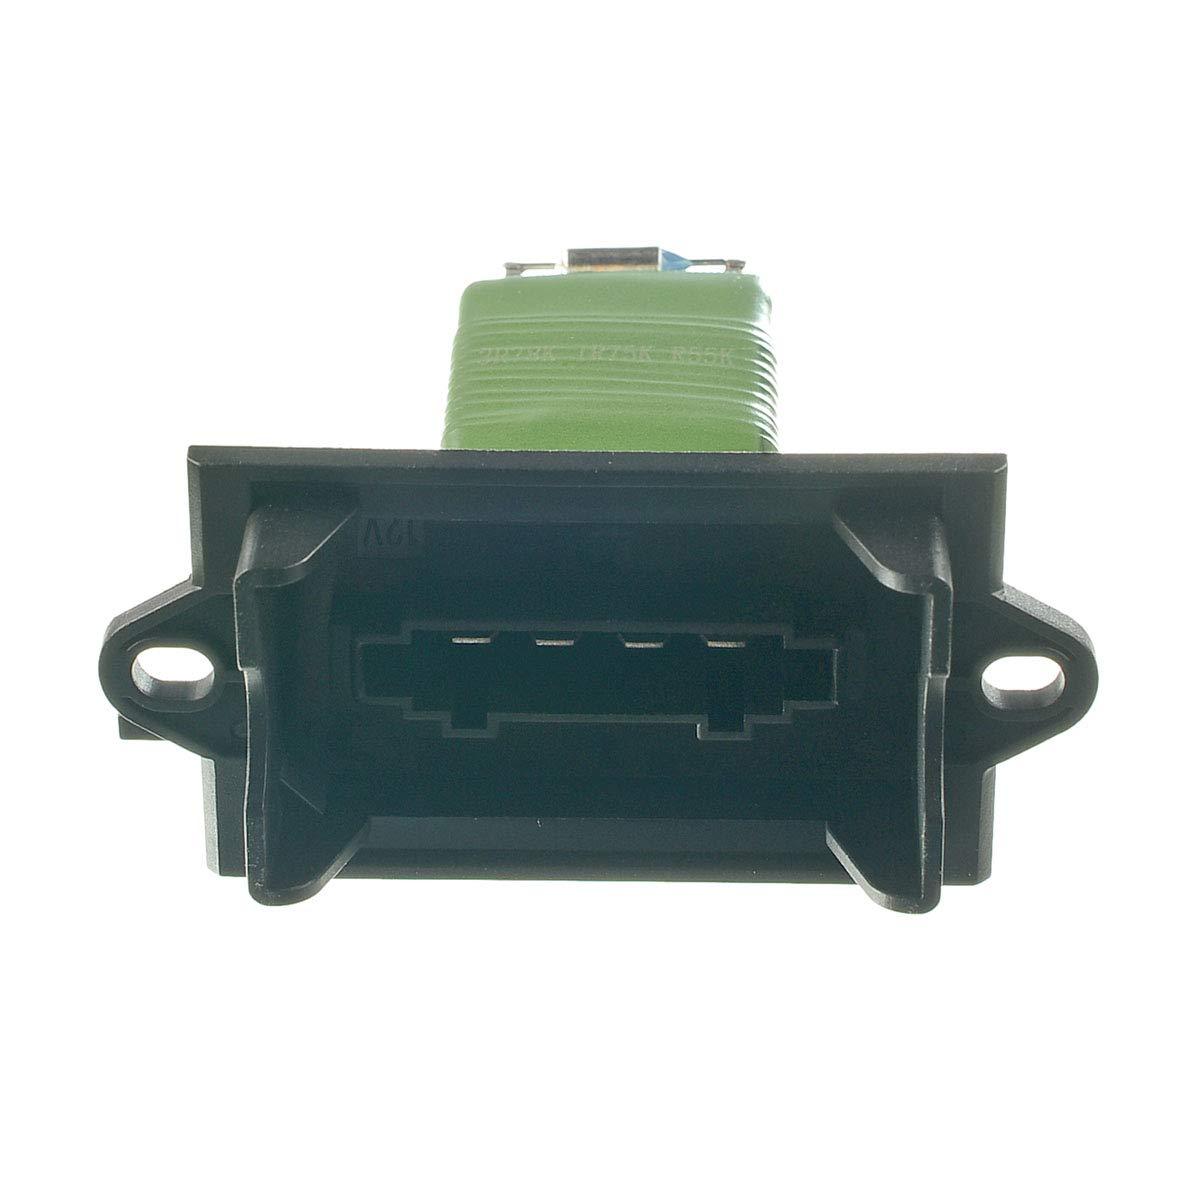 2011//01 Resistencias Motor ventilador regulador para C2 JM C3 FC HB 1007 KM a/ño de fabricaci/ón 2002//02